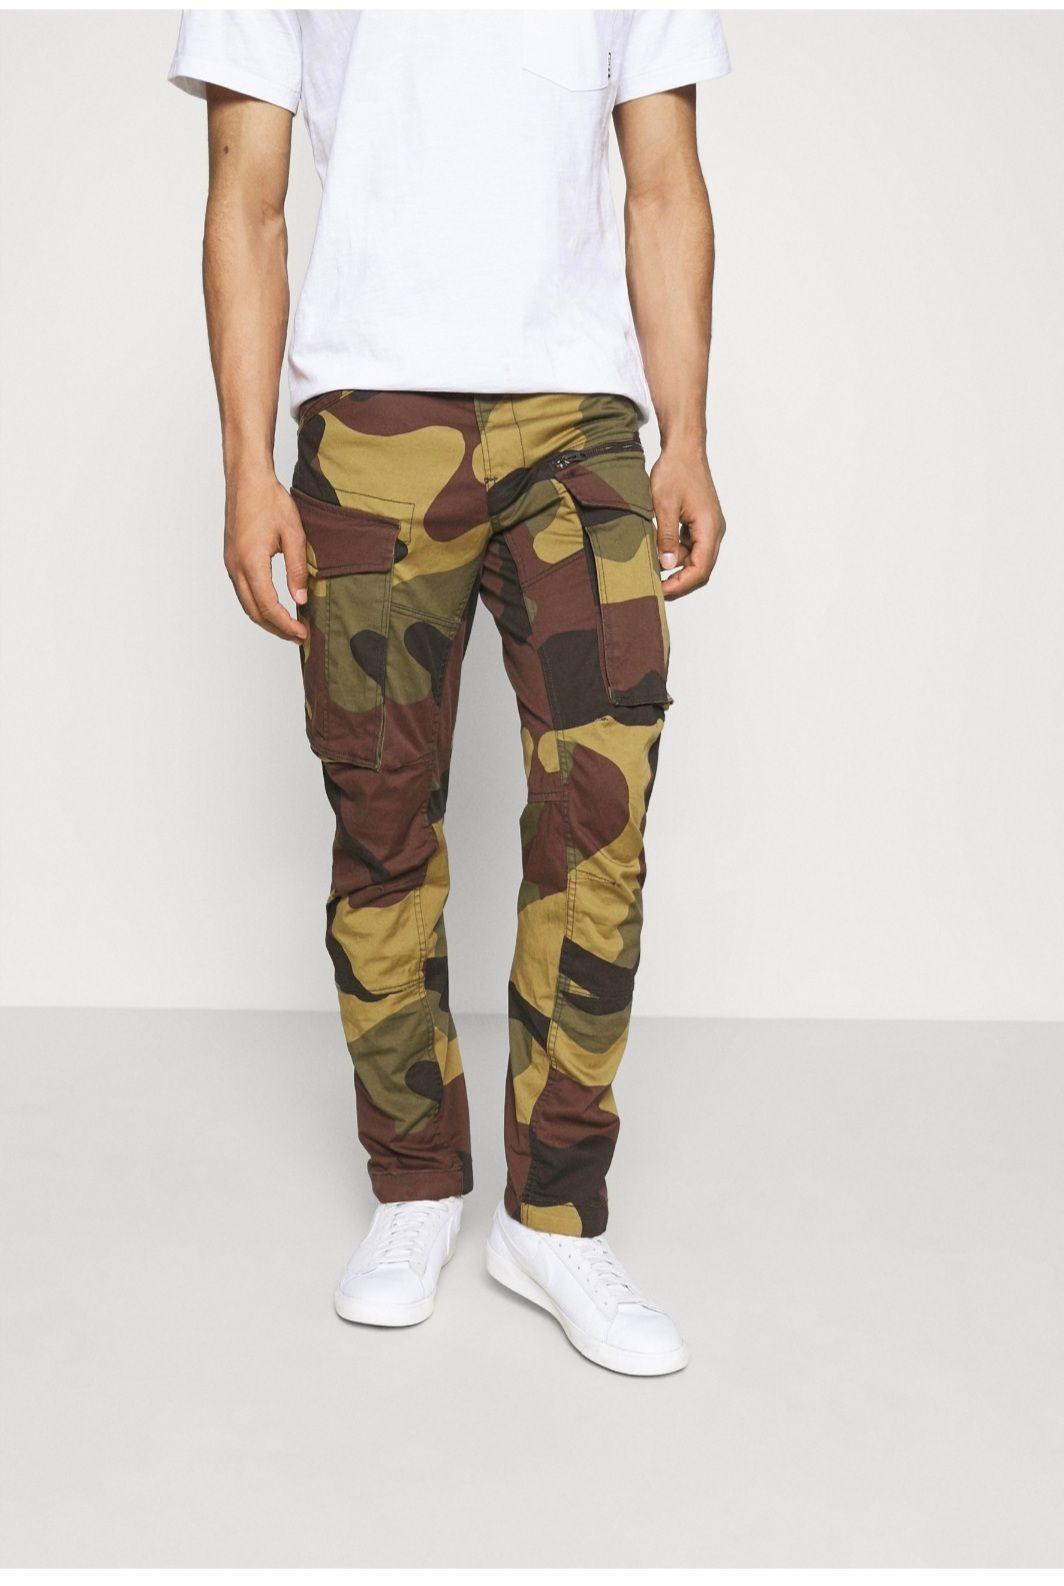 G-Star Rovic Cargo Camouflage Hose